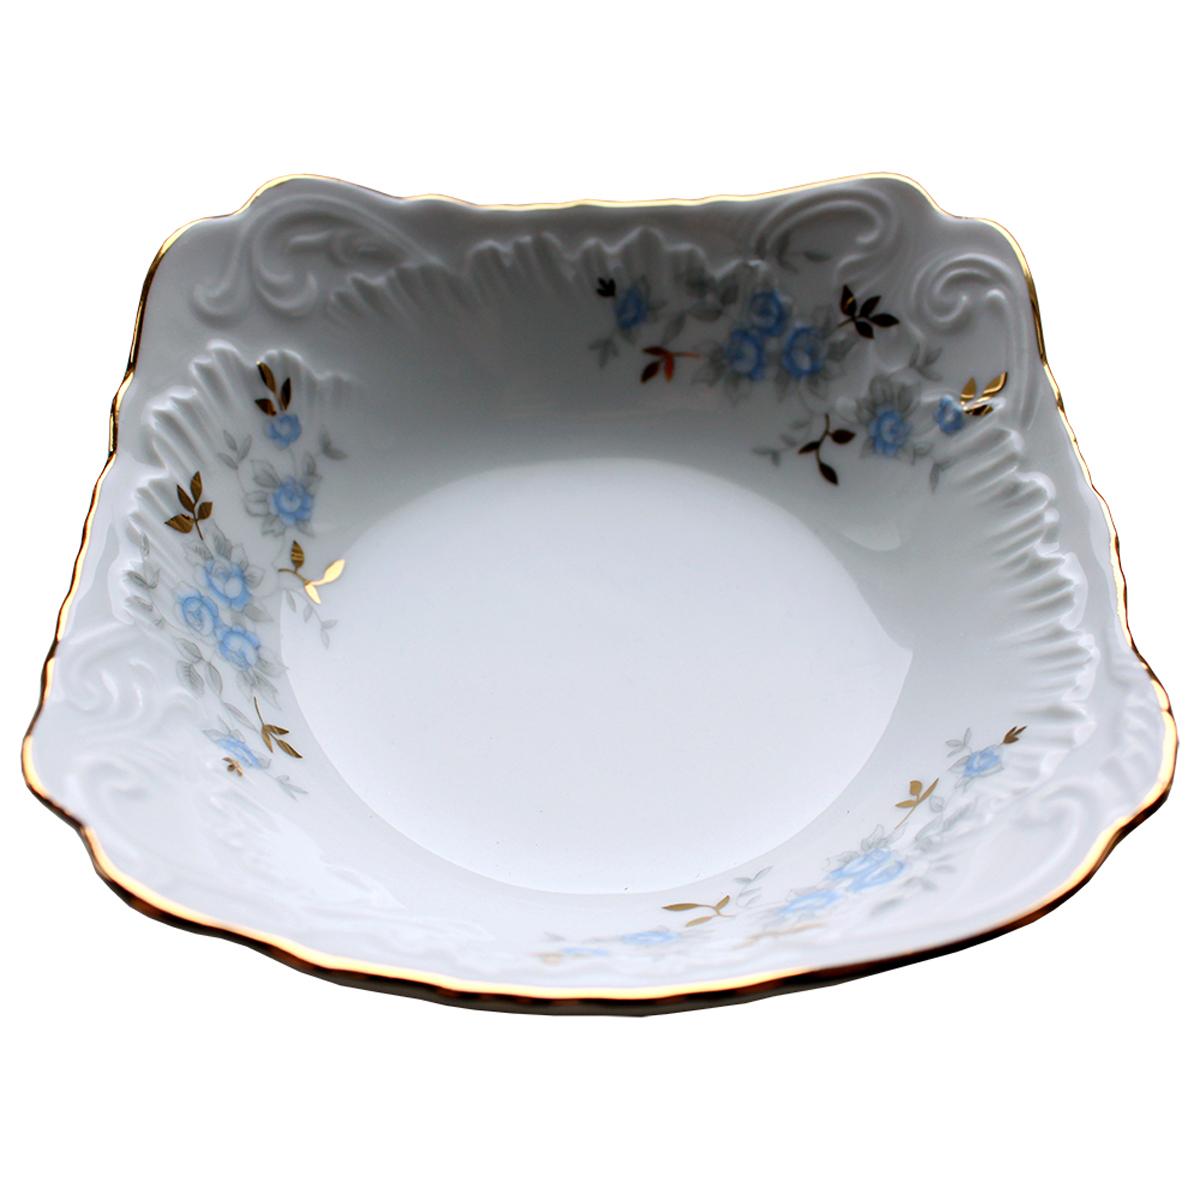 Салатник Cmielow Rococo. Голубой цветок, диаметр 14 см столы